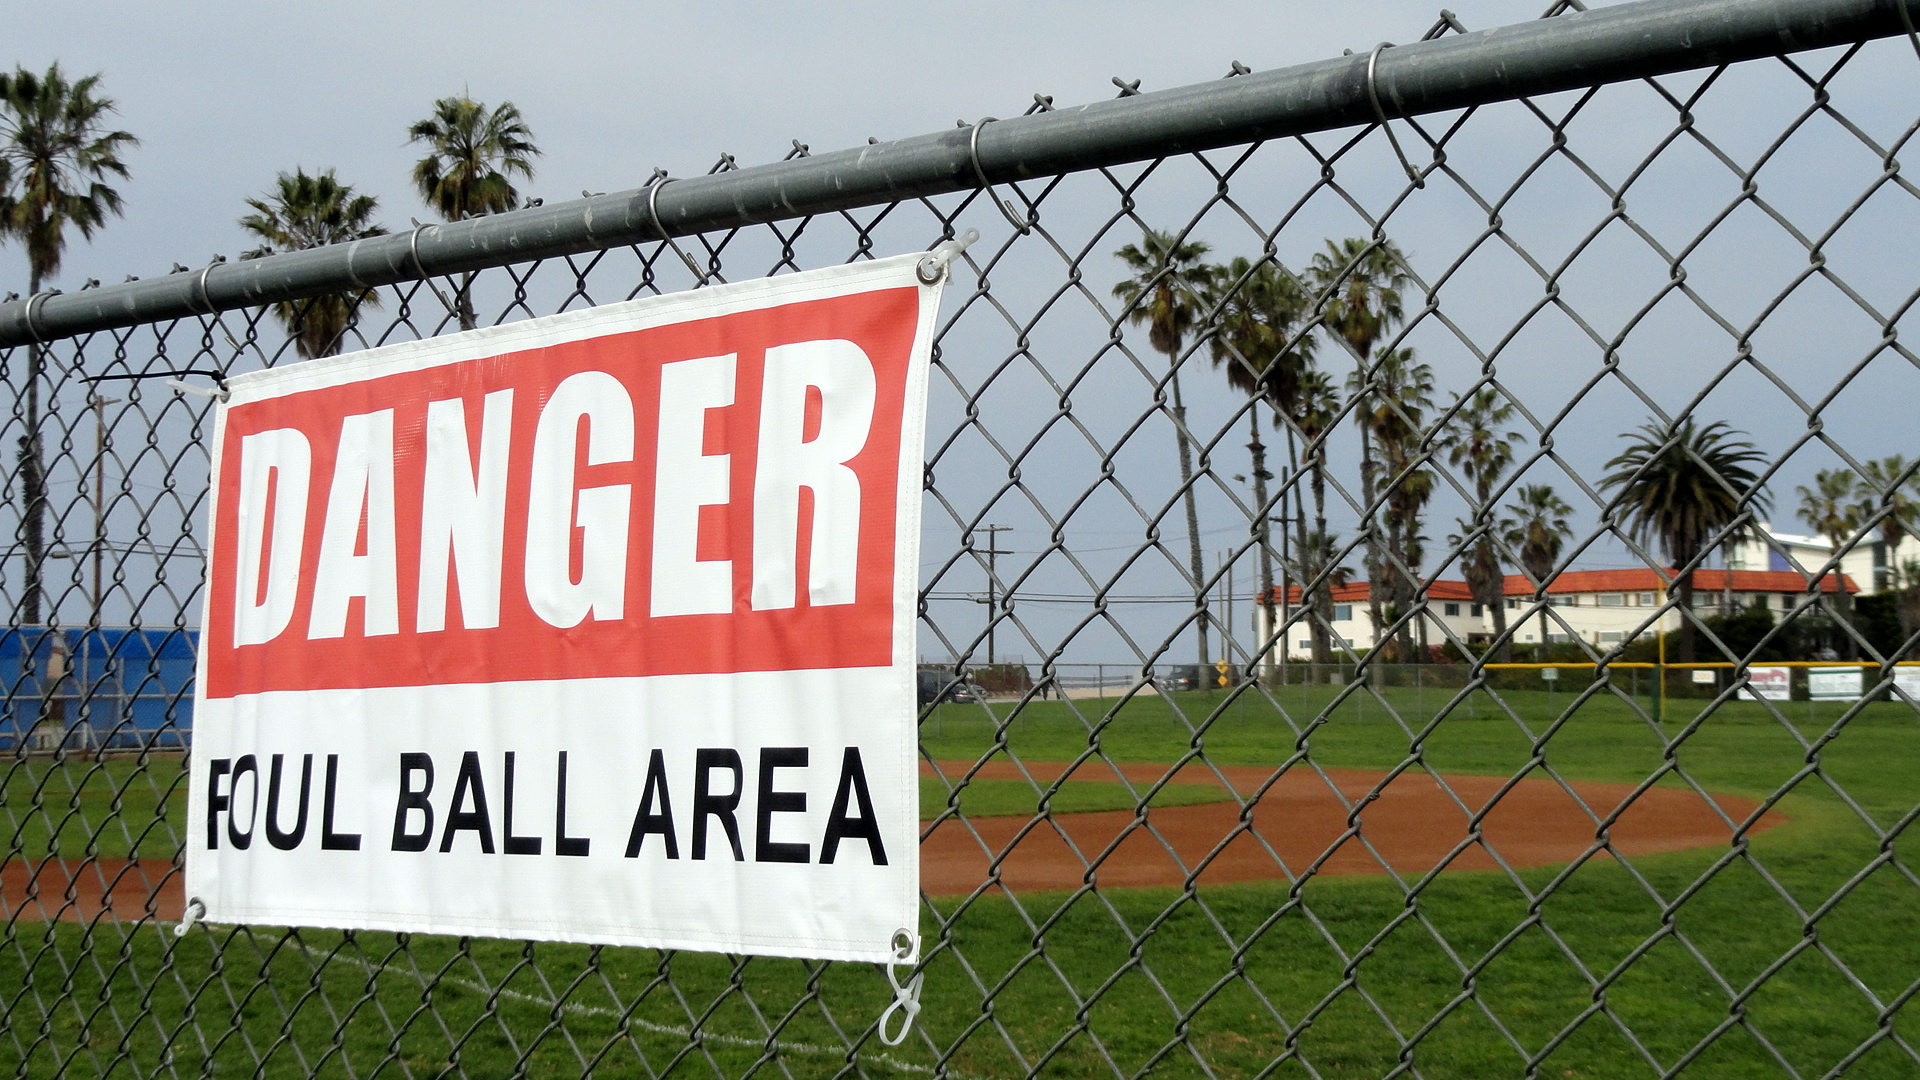 PDR Foul Ball Area